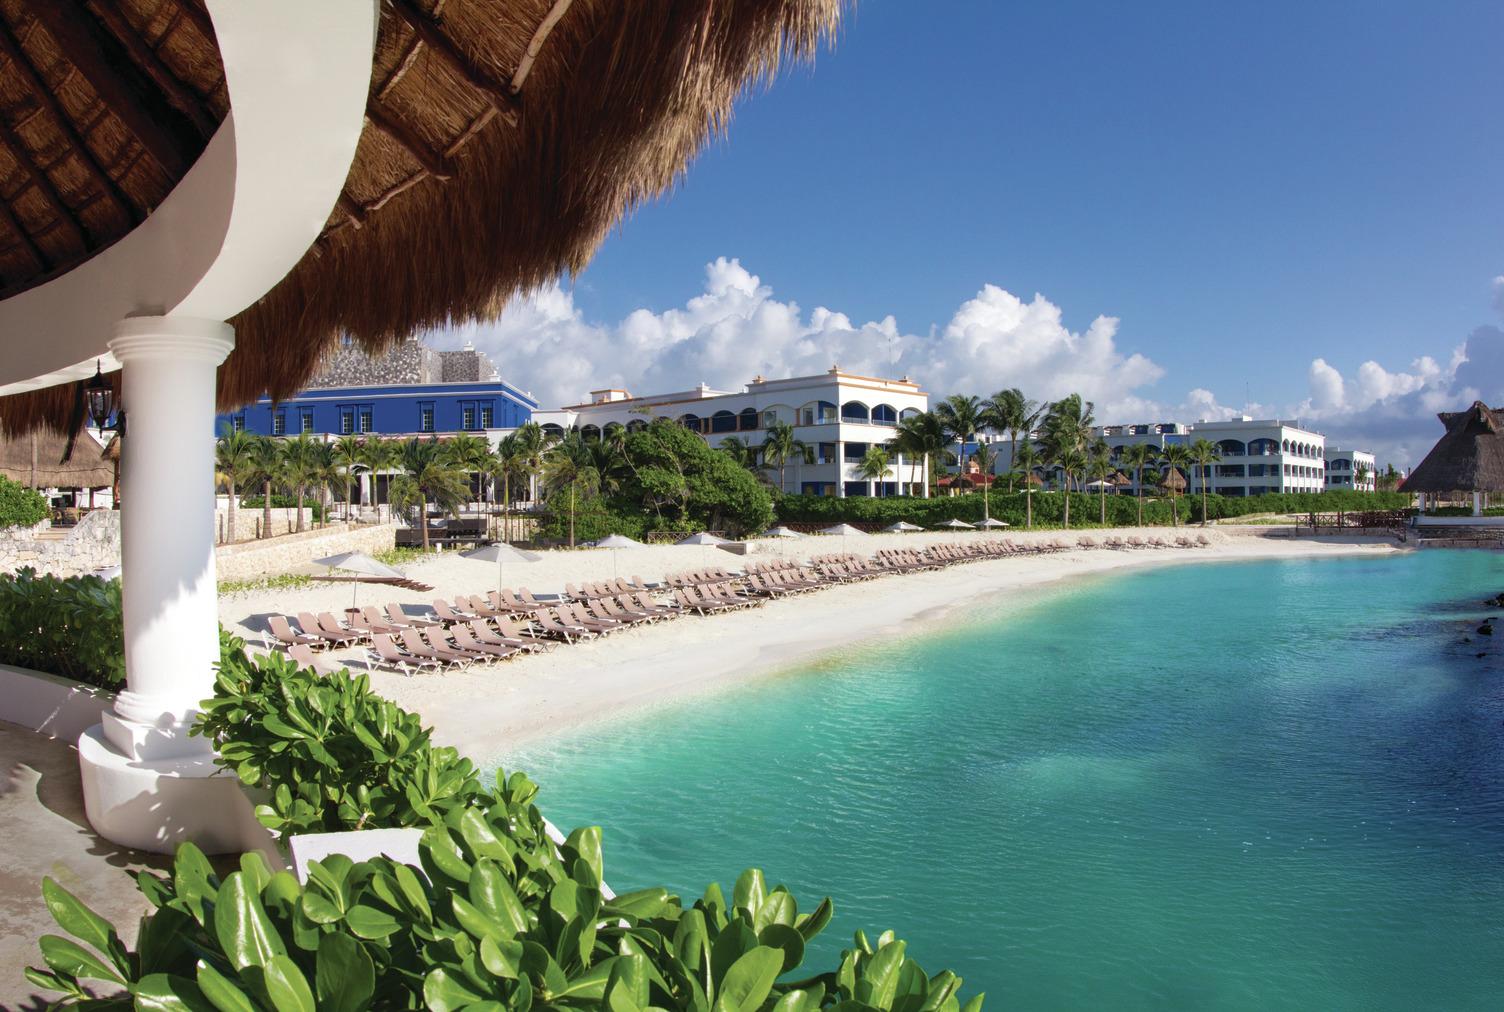 Travel Agency All-Inclusive Resort Heaven at Hard Rock Hotel Riviera Maya 10